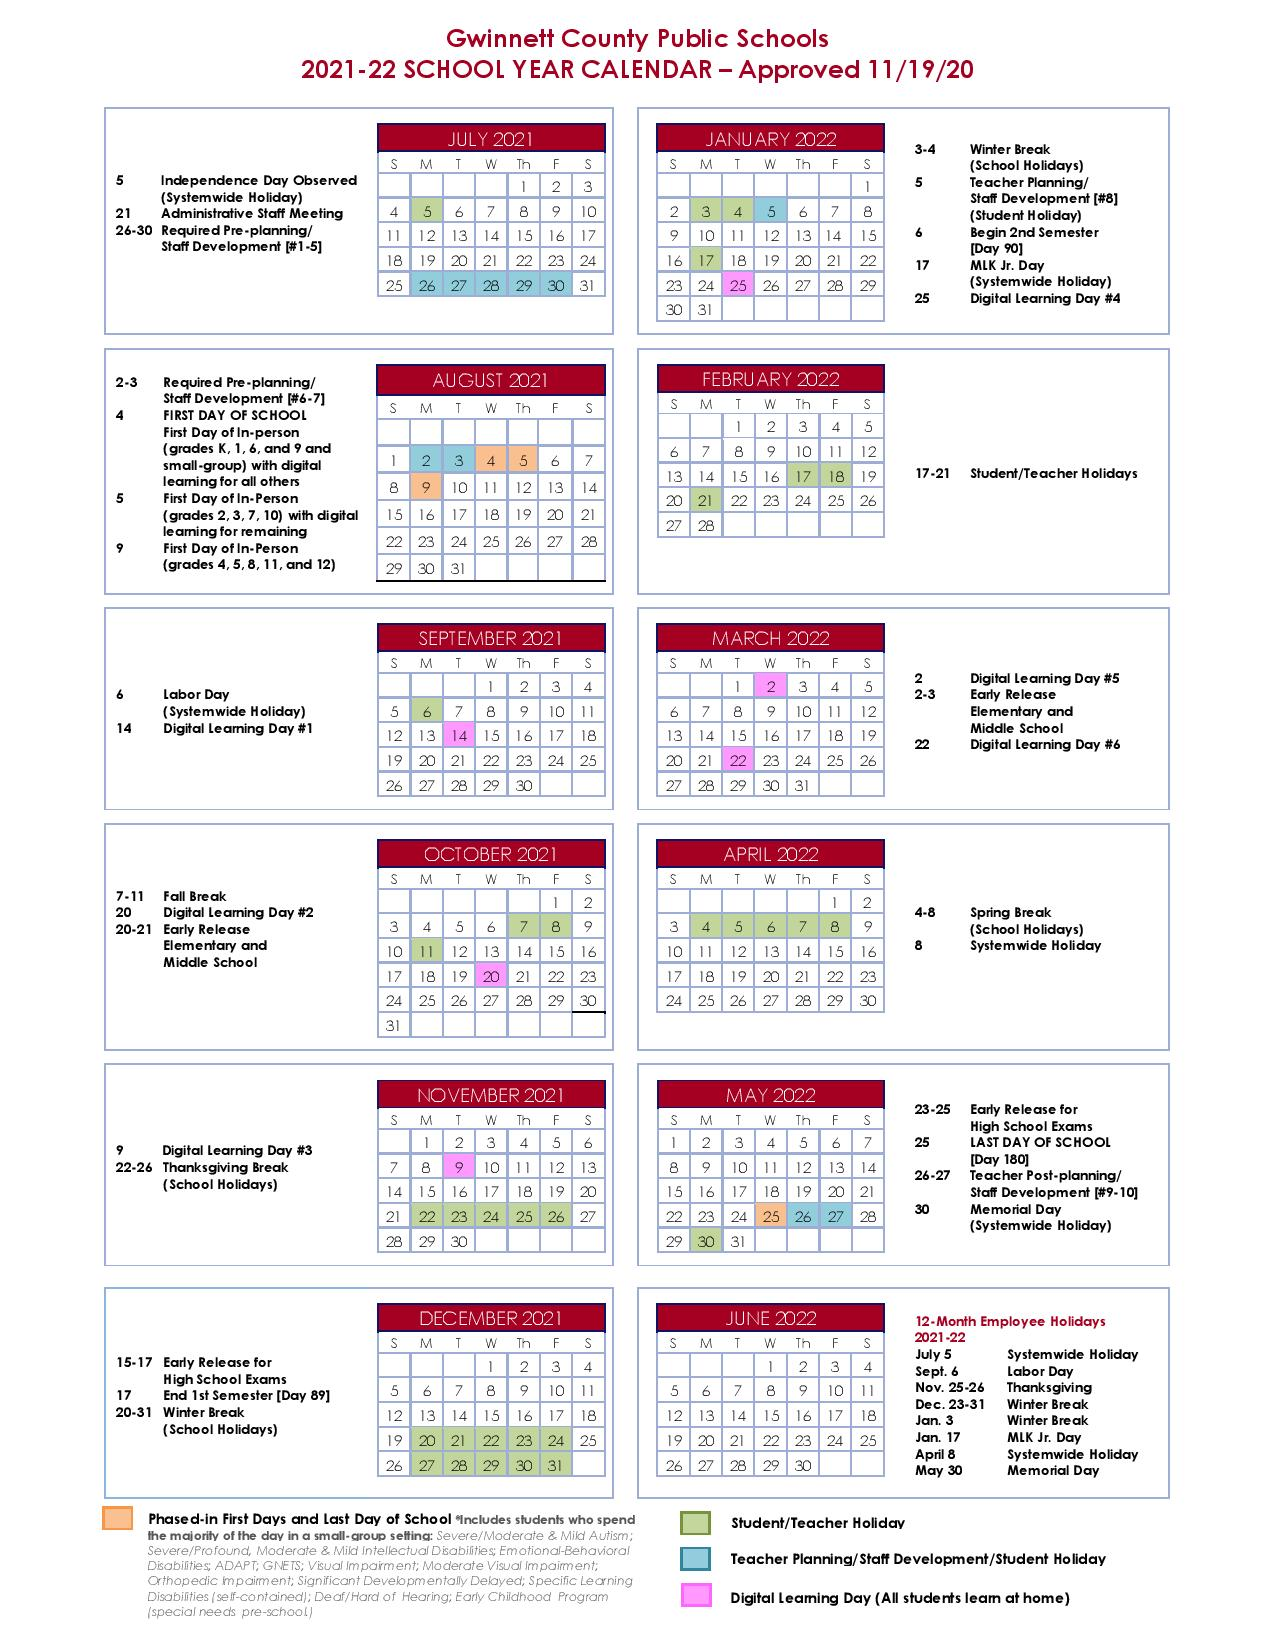 Gwinnett County Schools Calendar 2022 23.Divqrh0j0oqsam